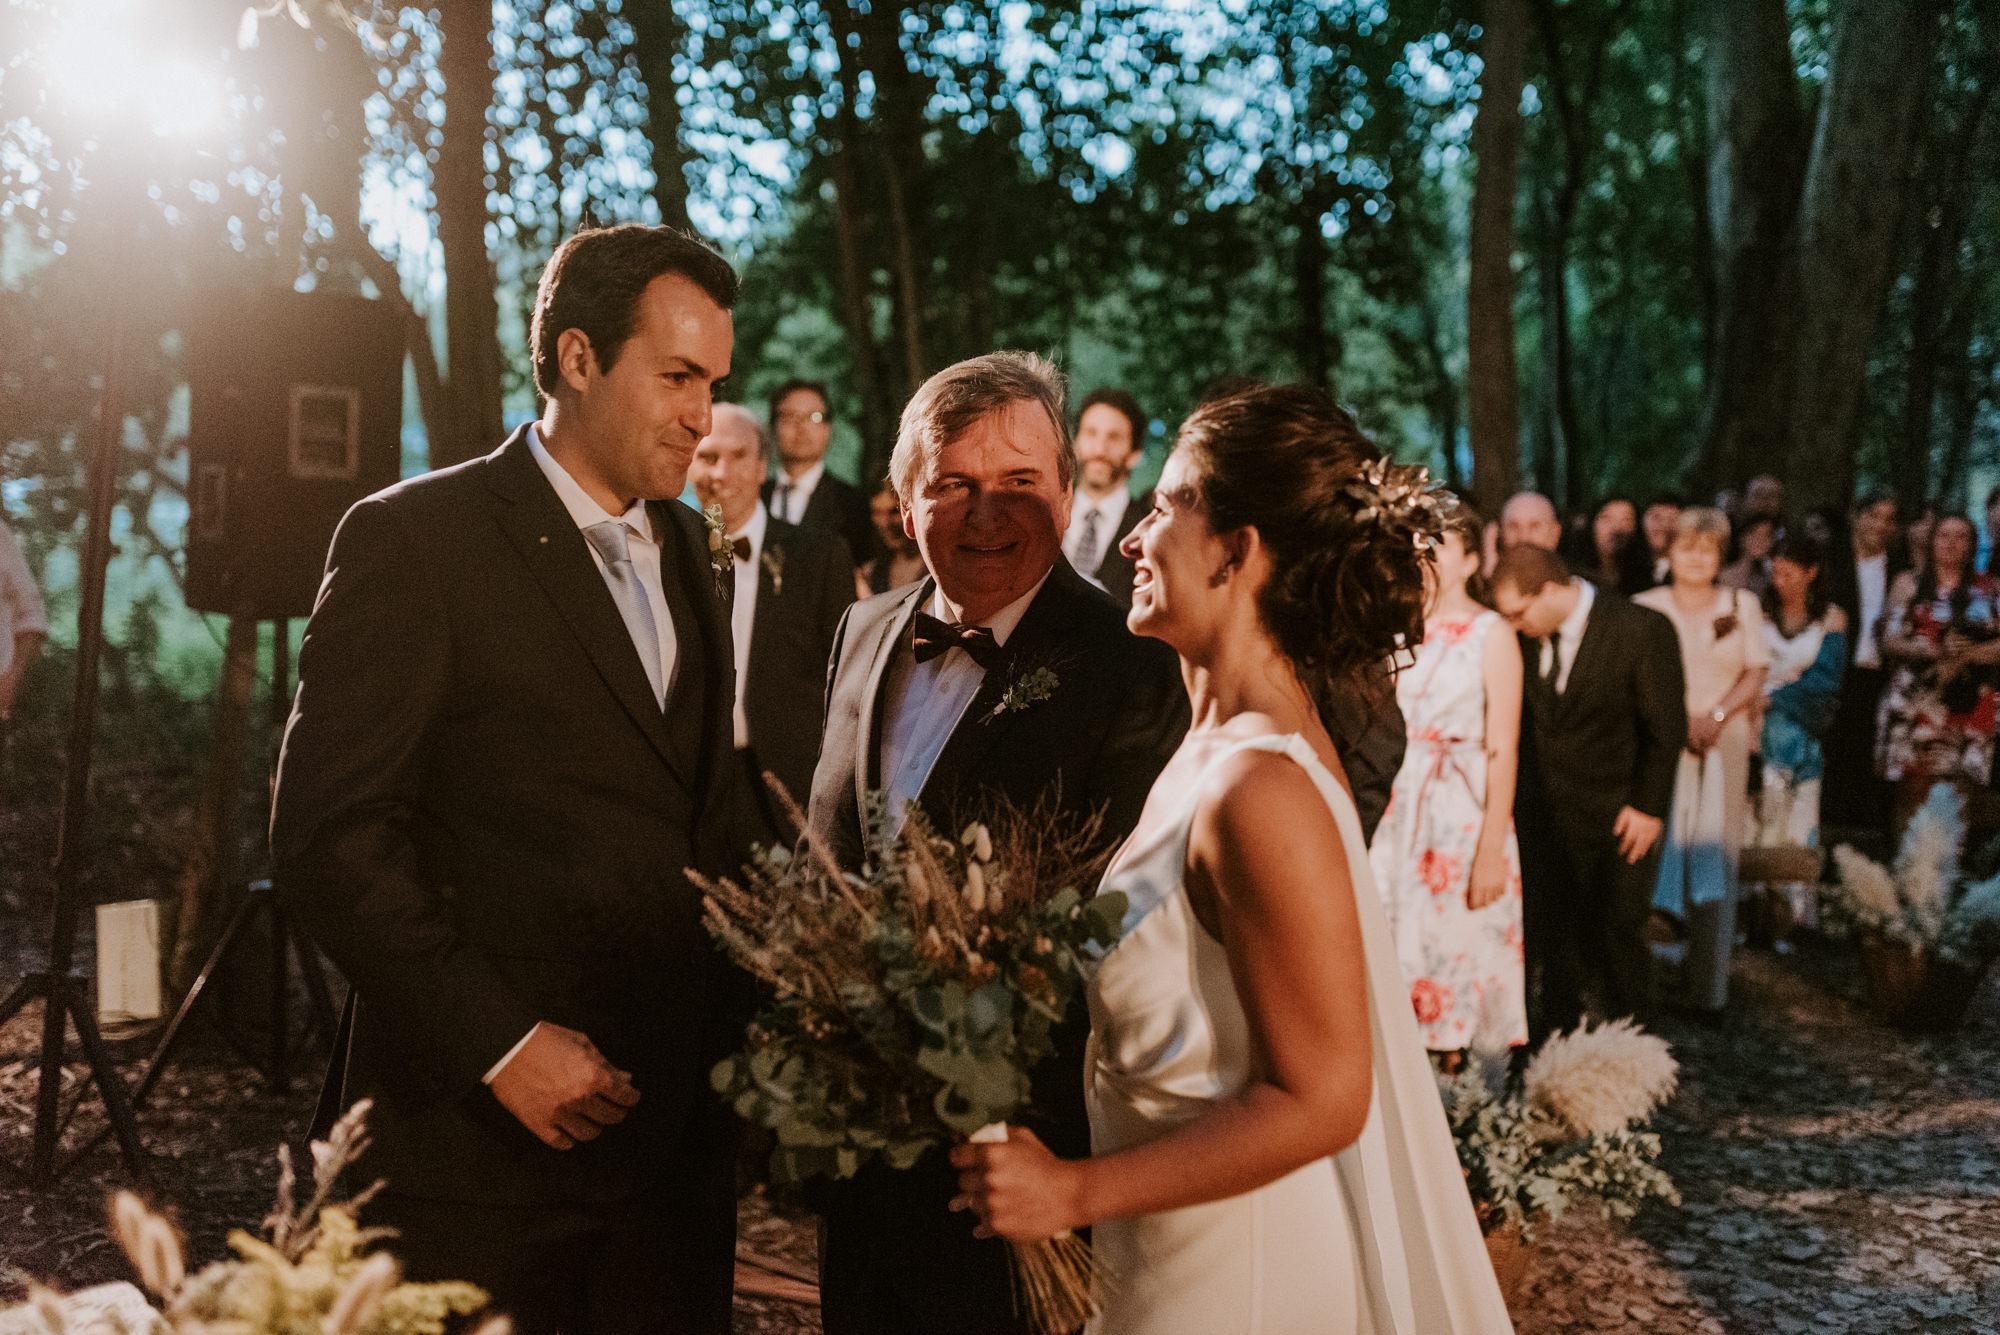 photography, mauricio,garay,wedding, fotografo ,photographer-382.jpg